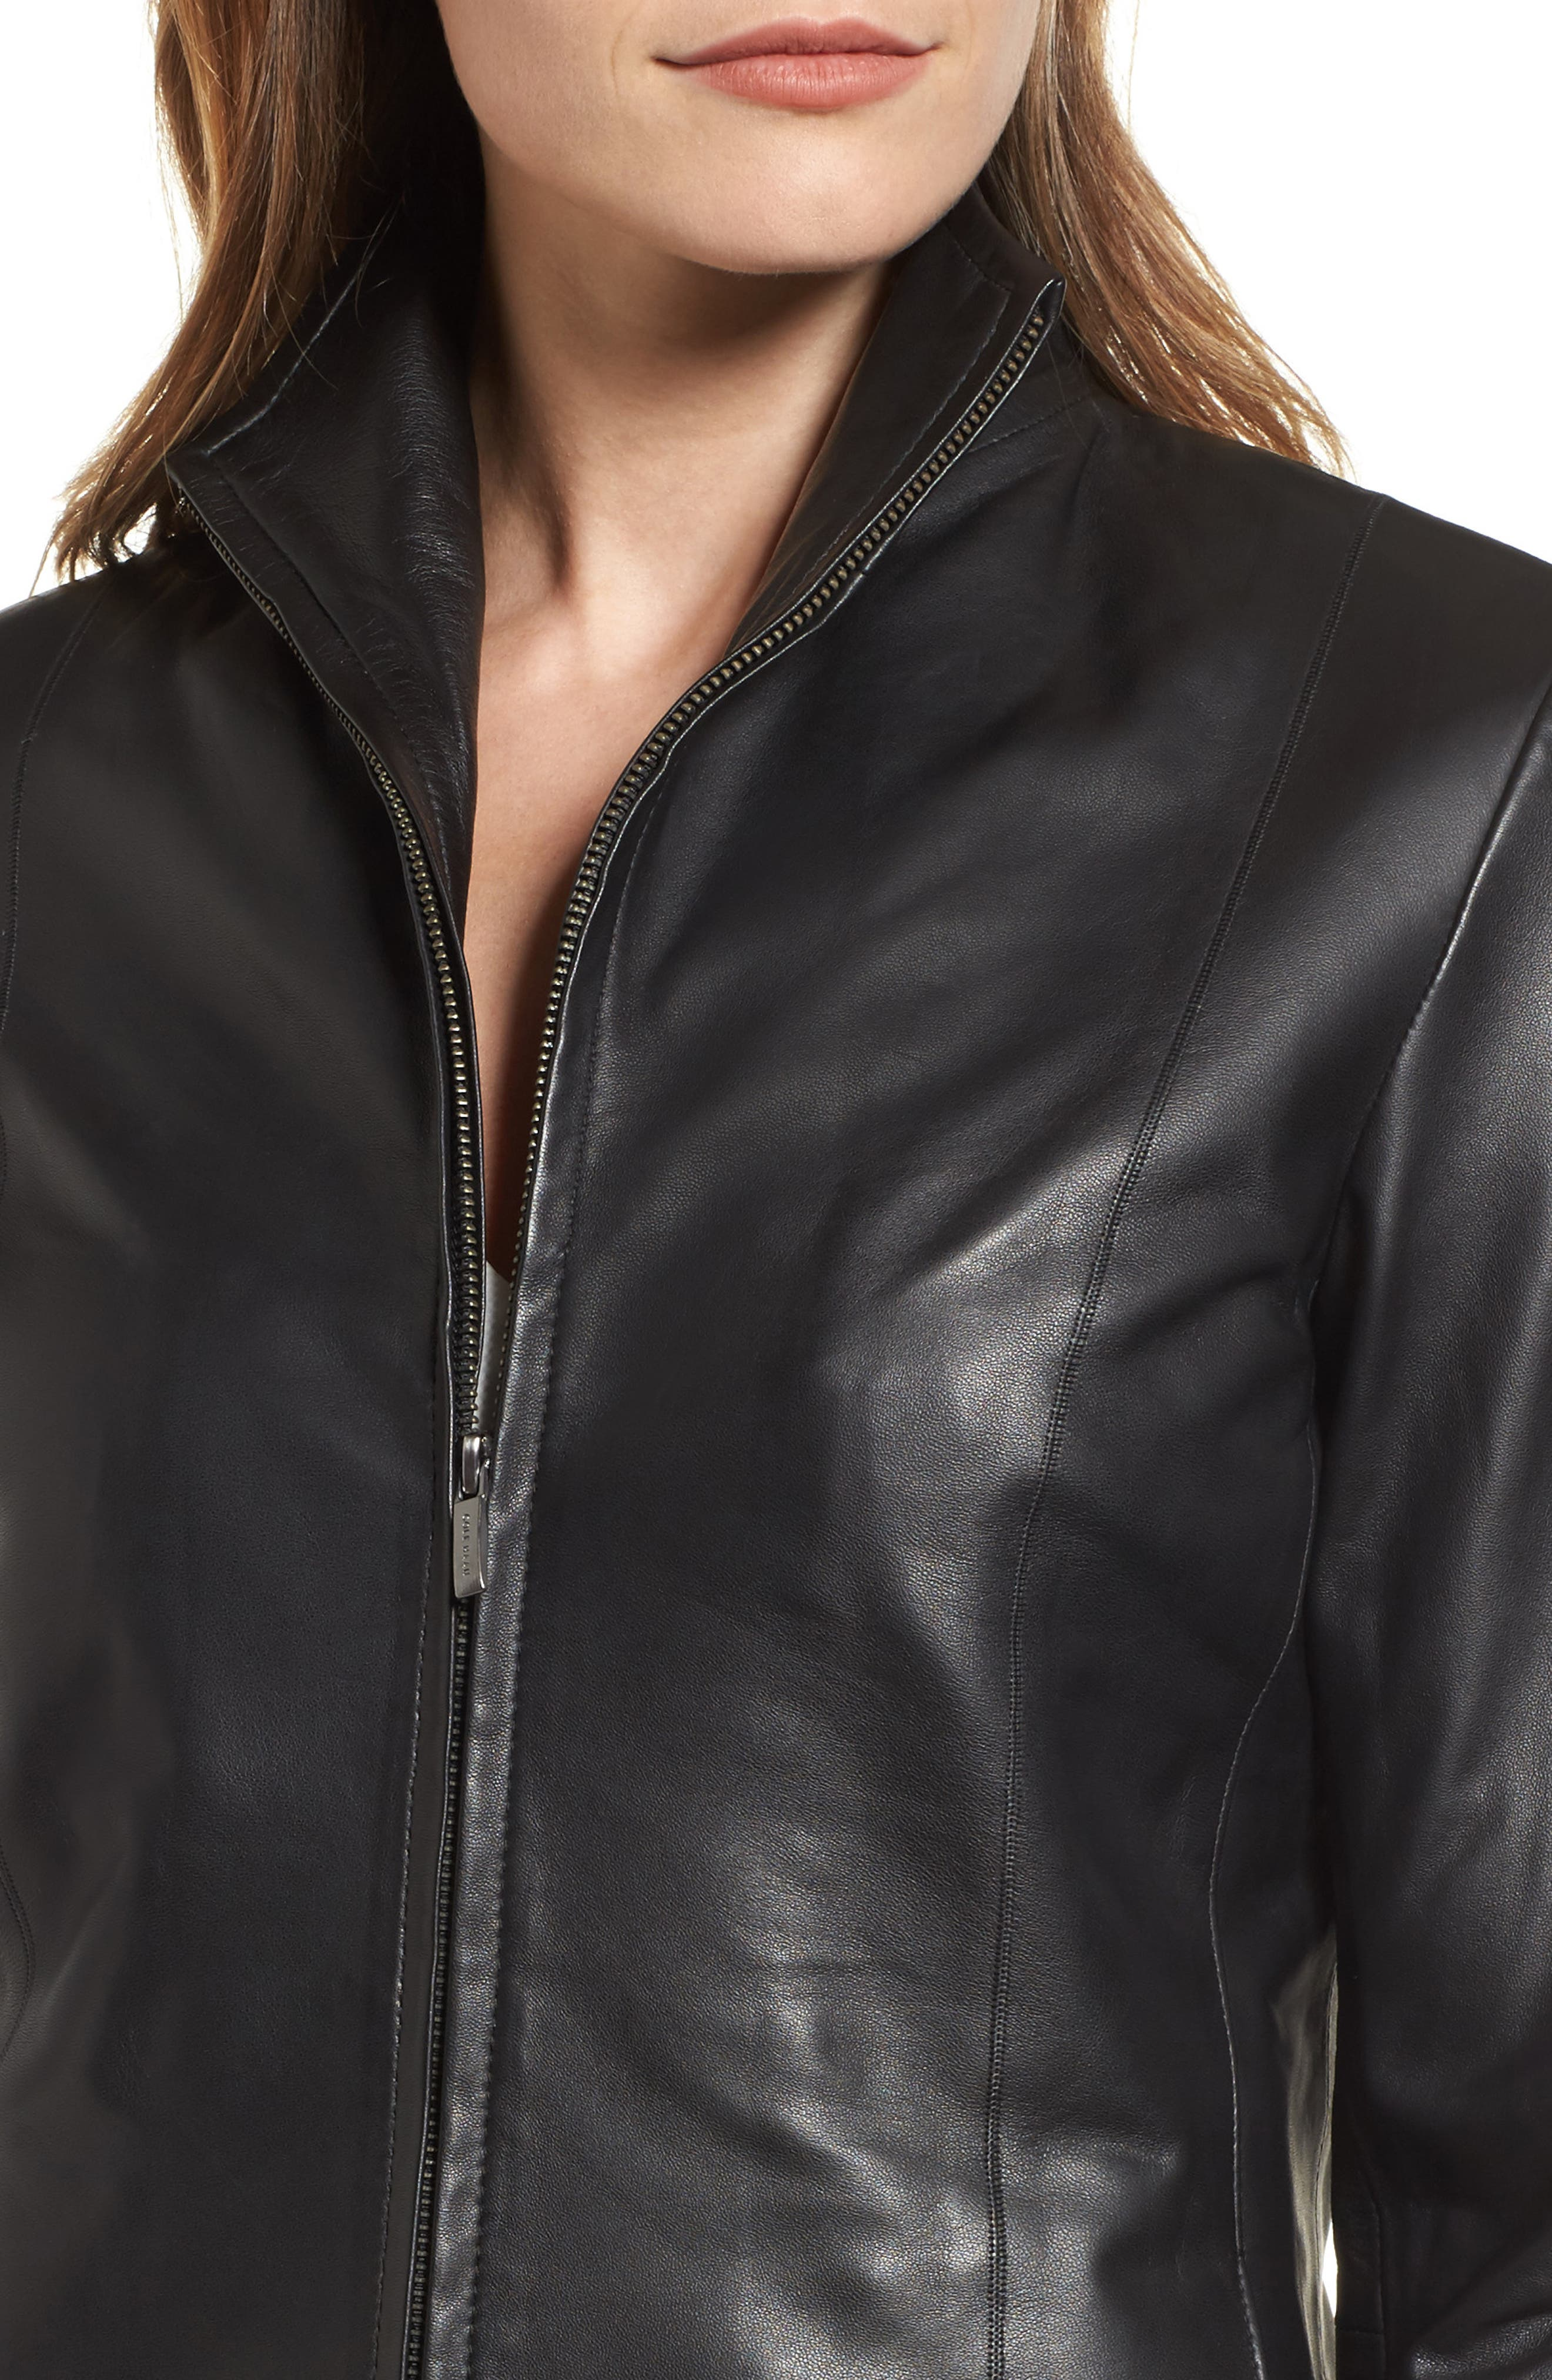 Lambskin Leather Scuba Jacket,                             Alternate thumbnail 4, color,                             Black